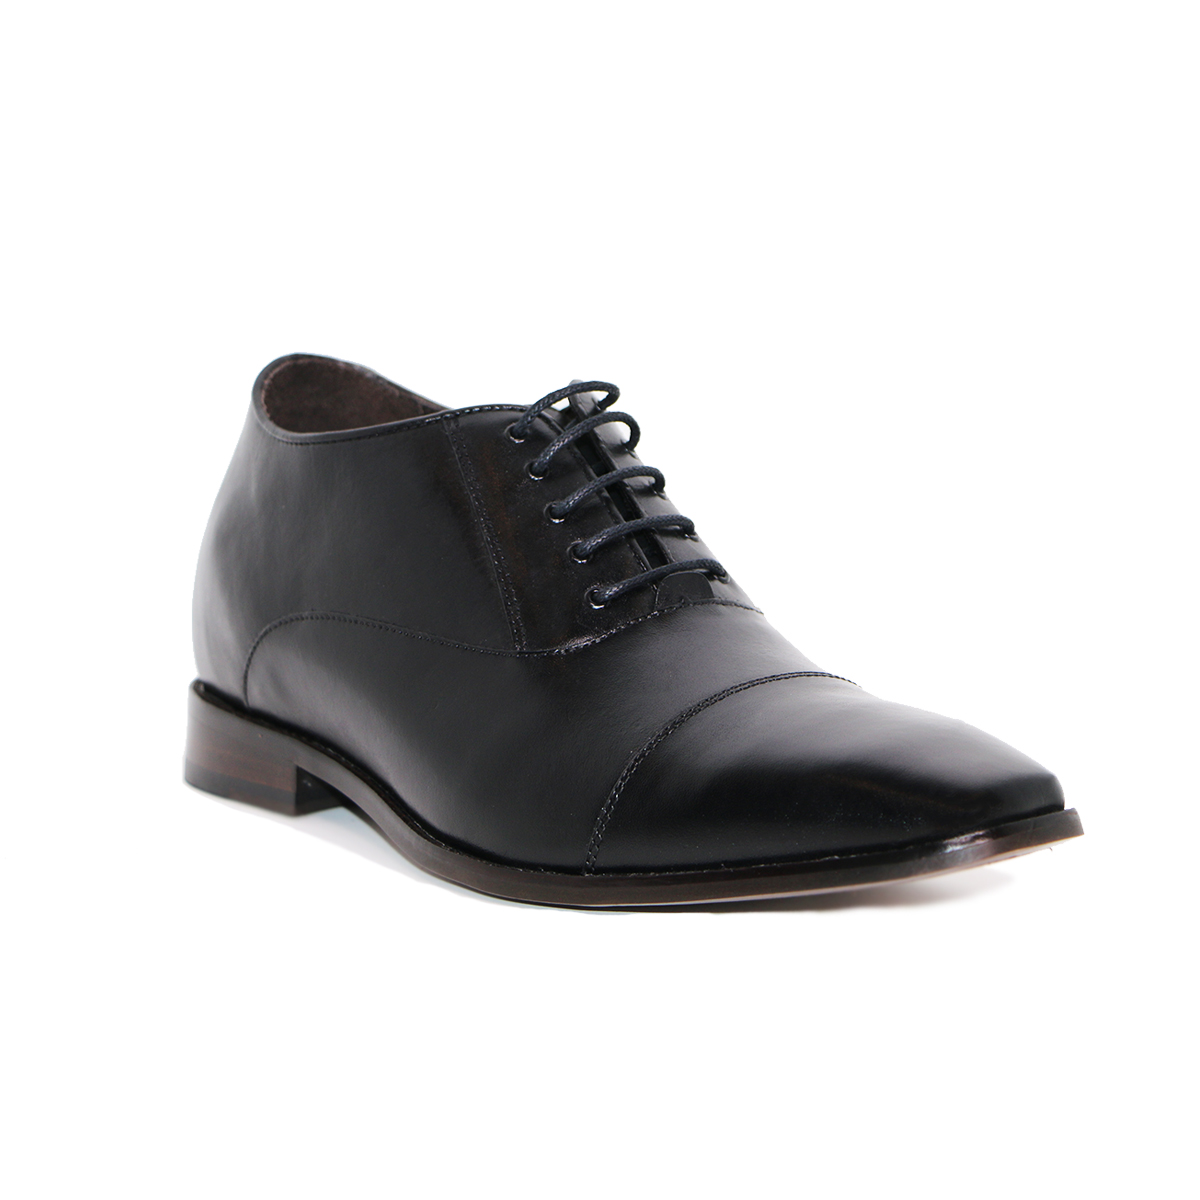 Zapato Formal Director Negro Max Denegri +7cms De Altura_72908